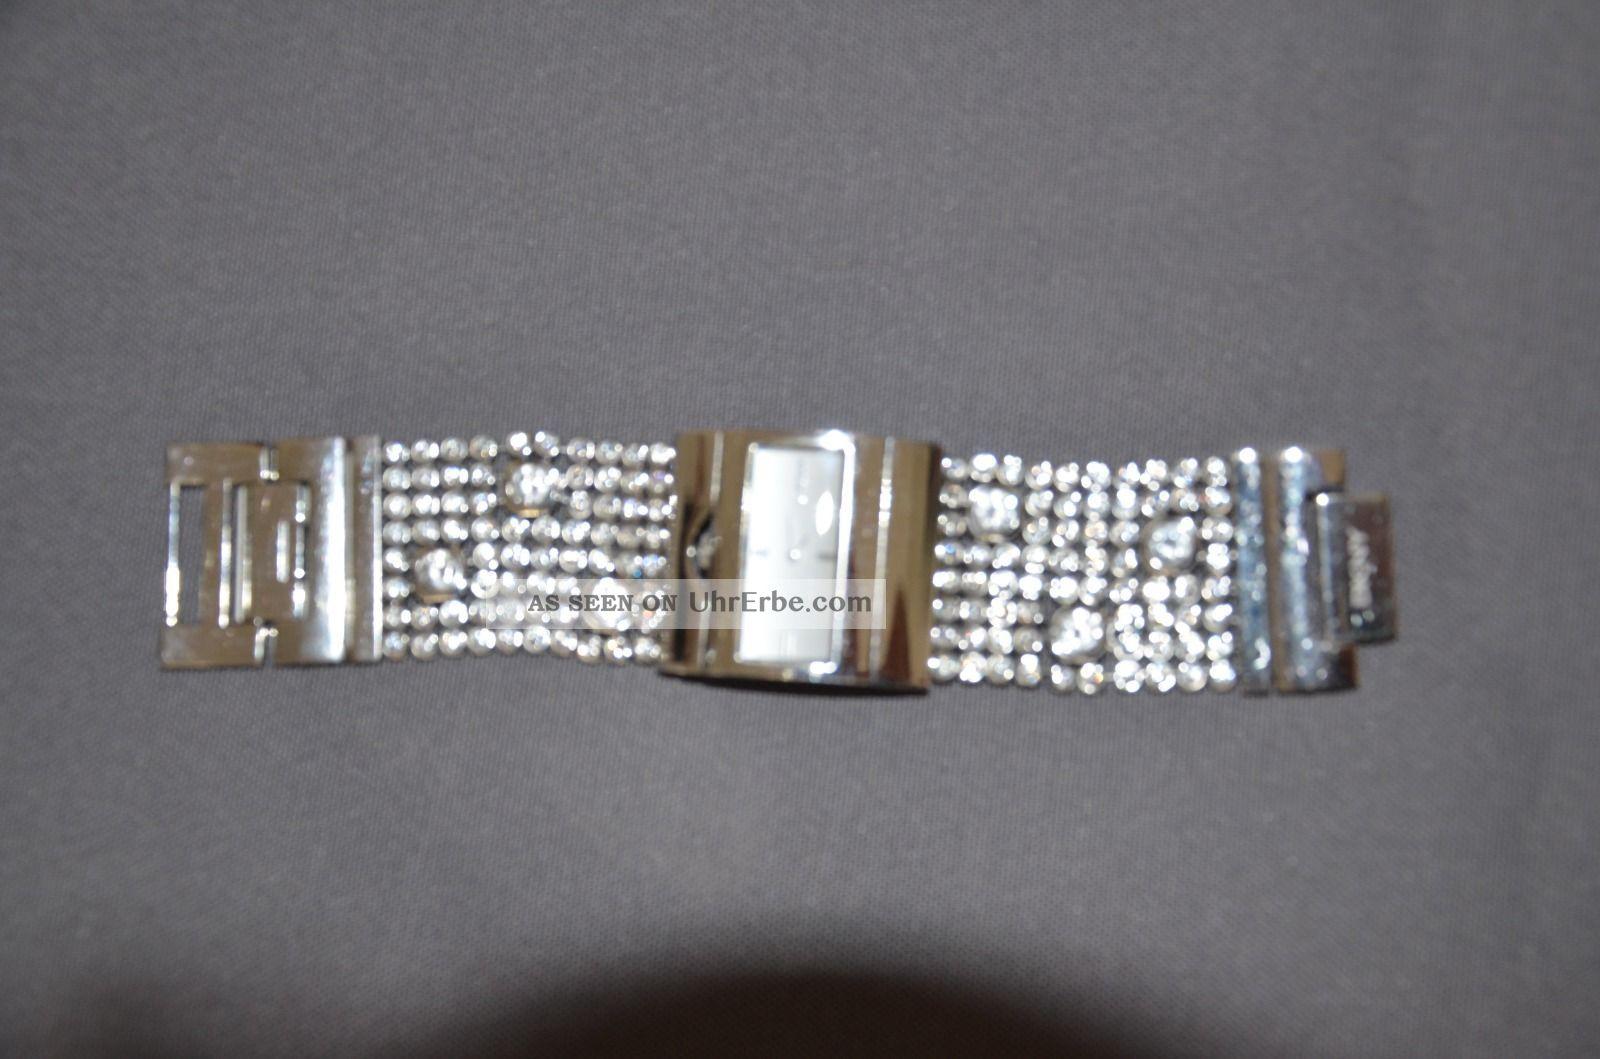 Dkny Damenuhr Armbanduhren Bild